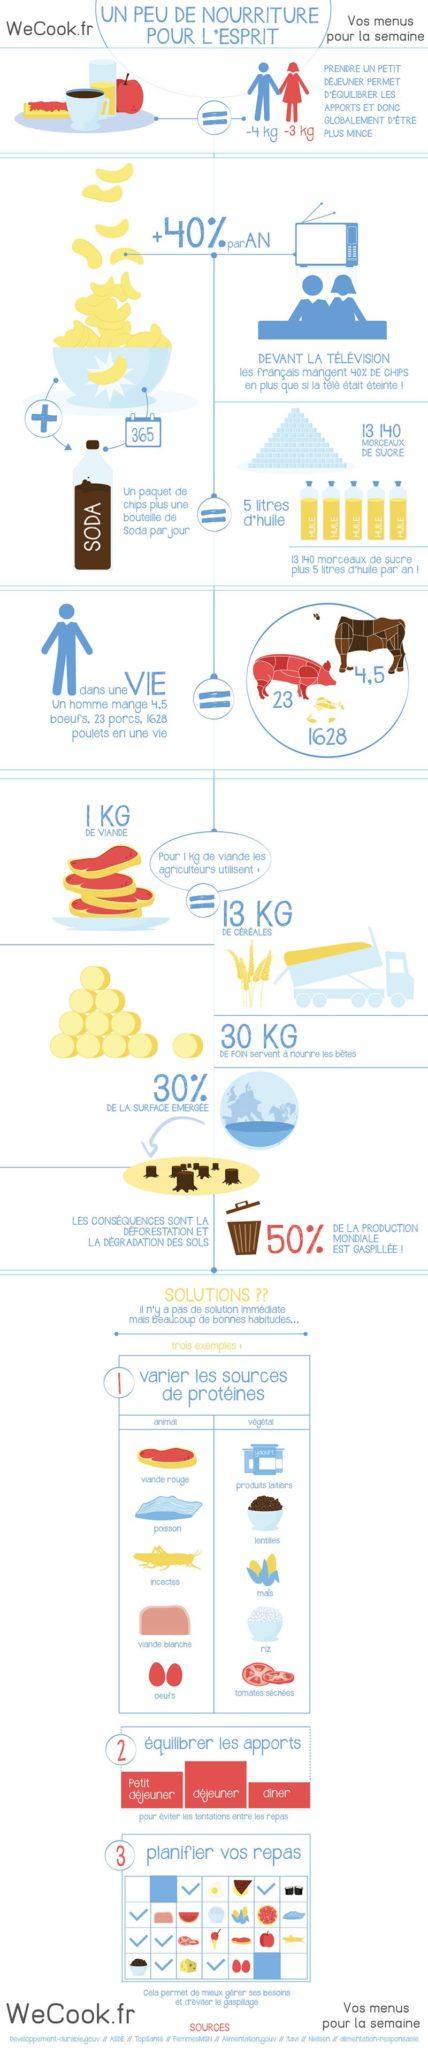 Infographie fitness et alimentation